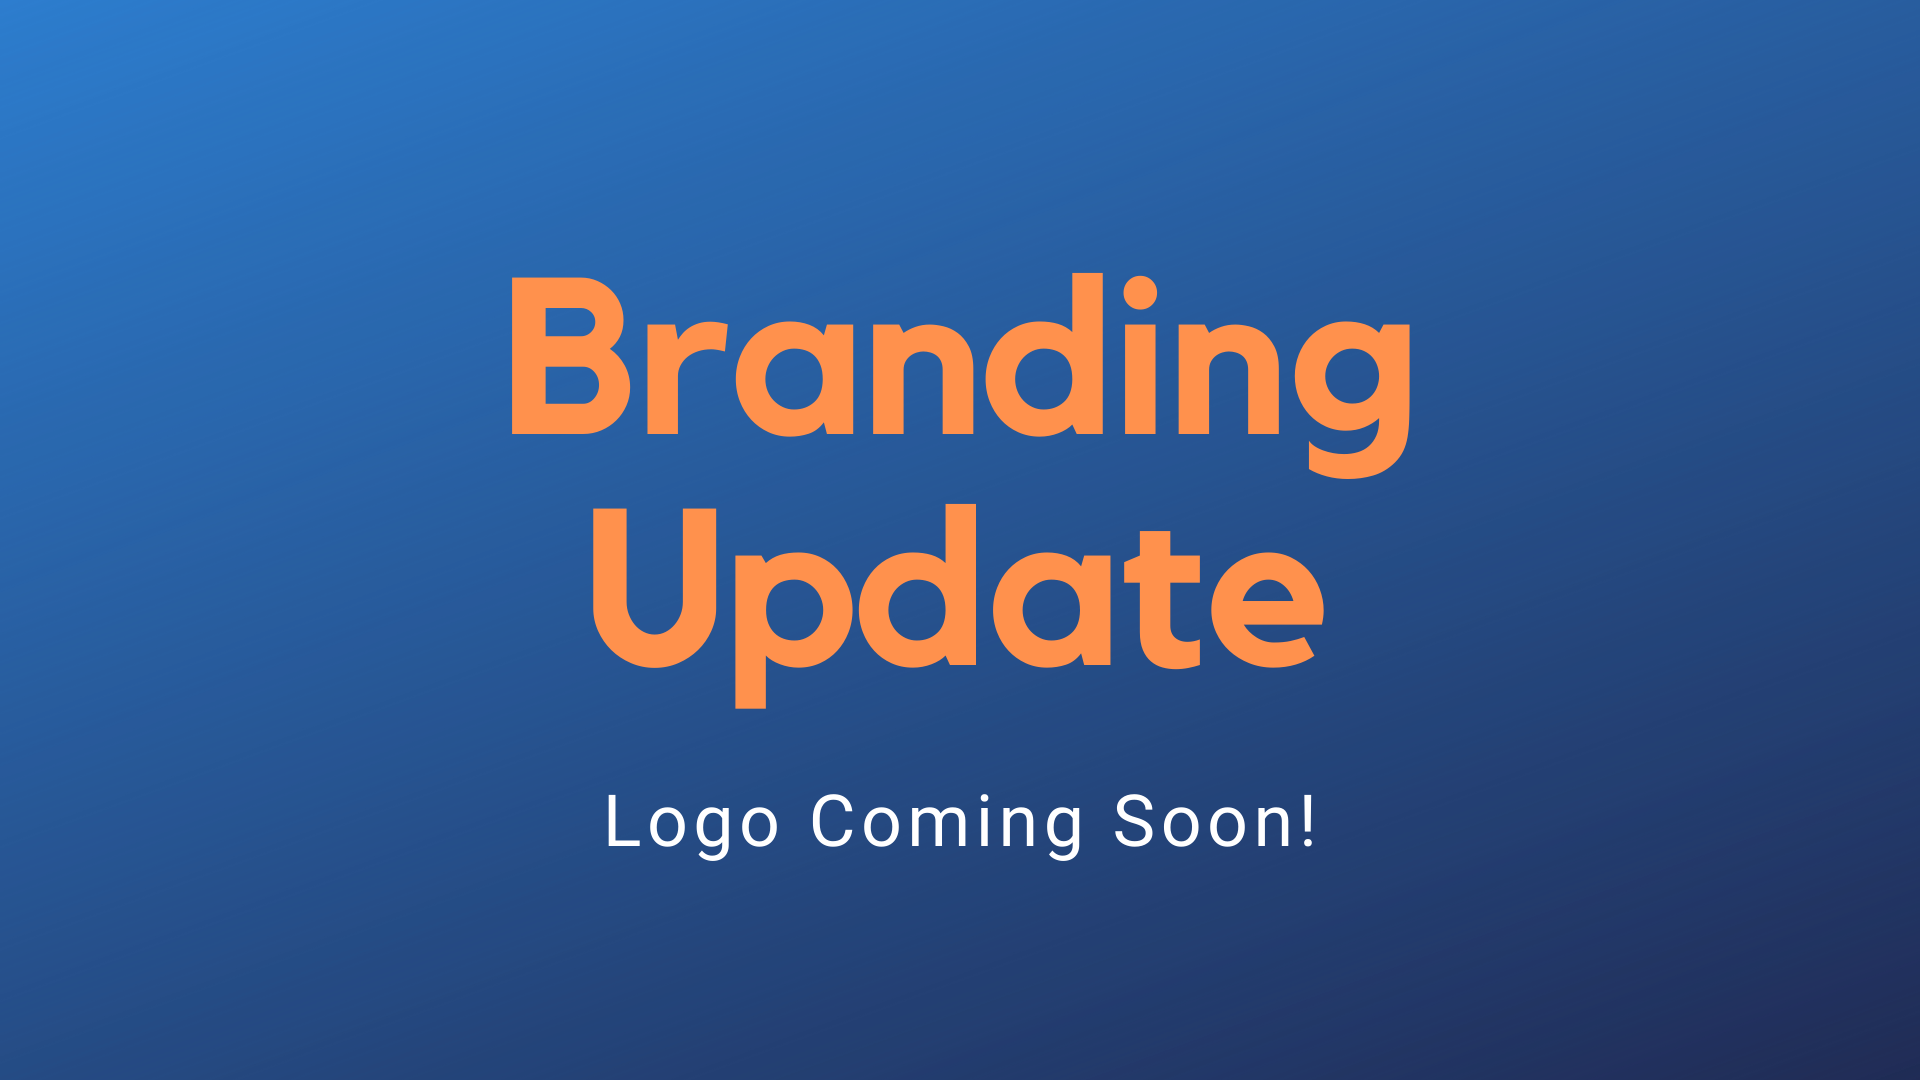 Branding Update